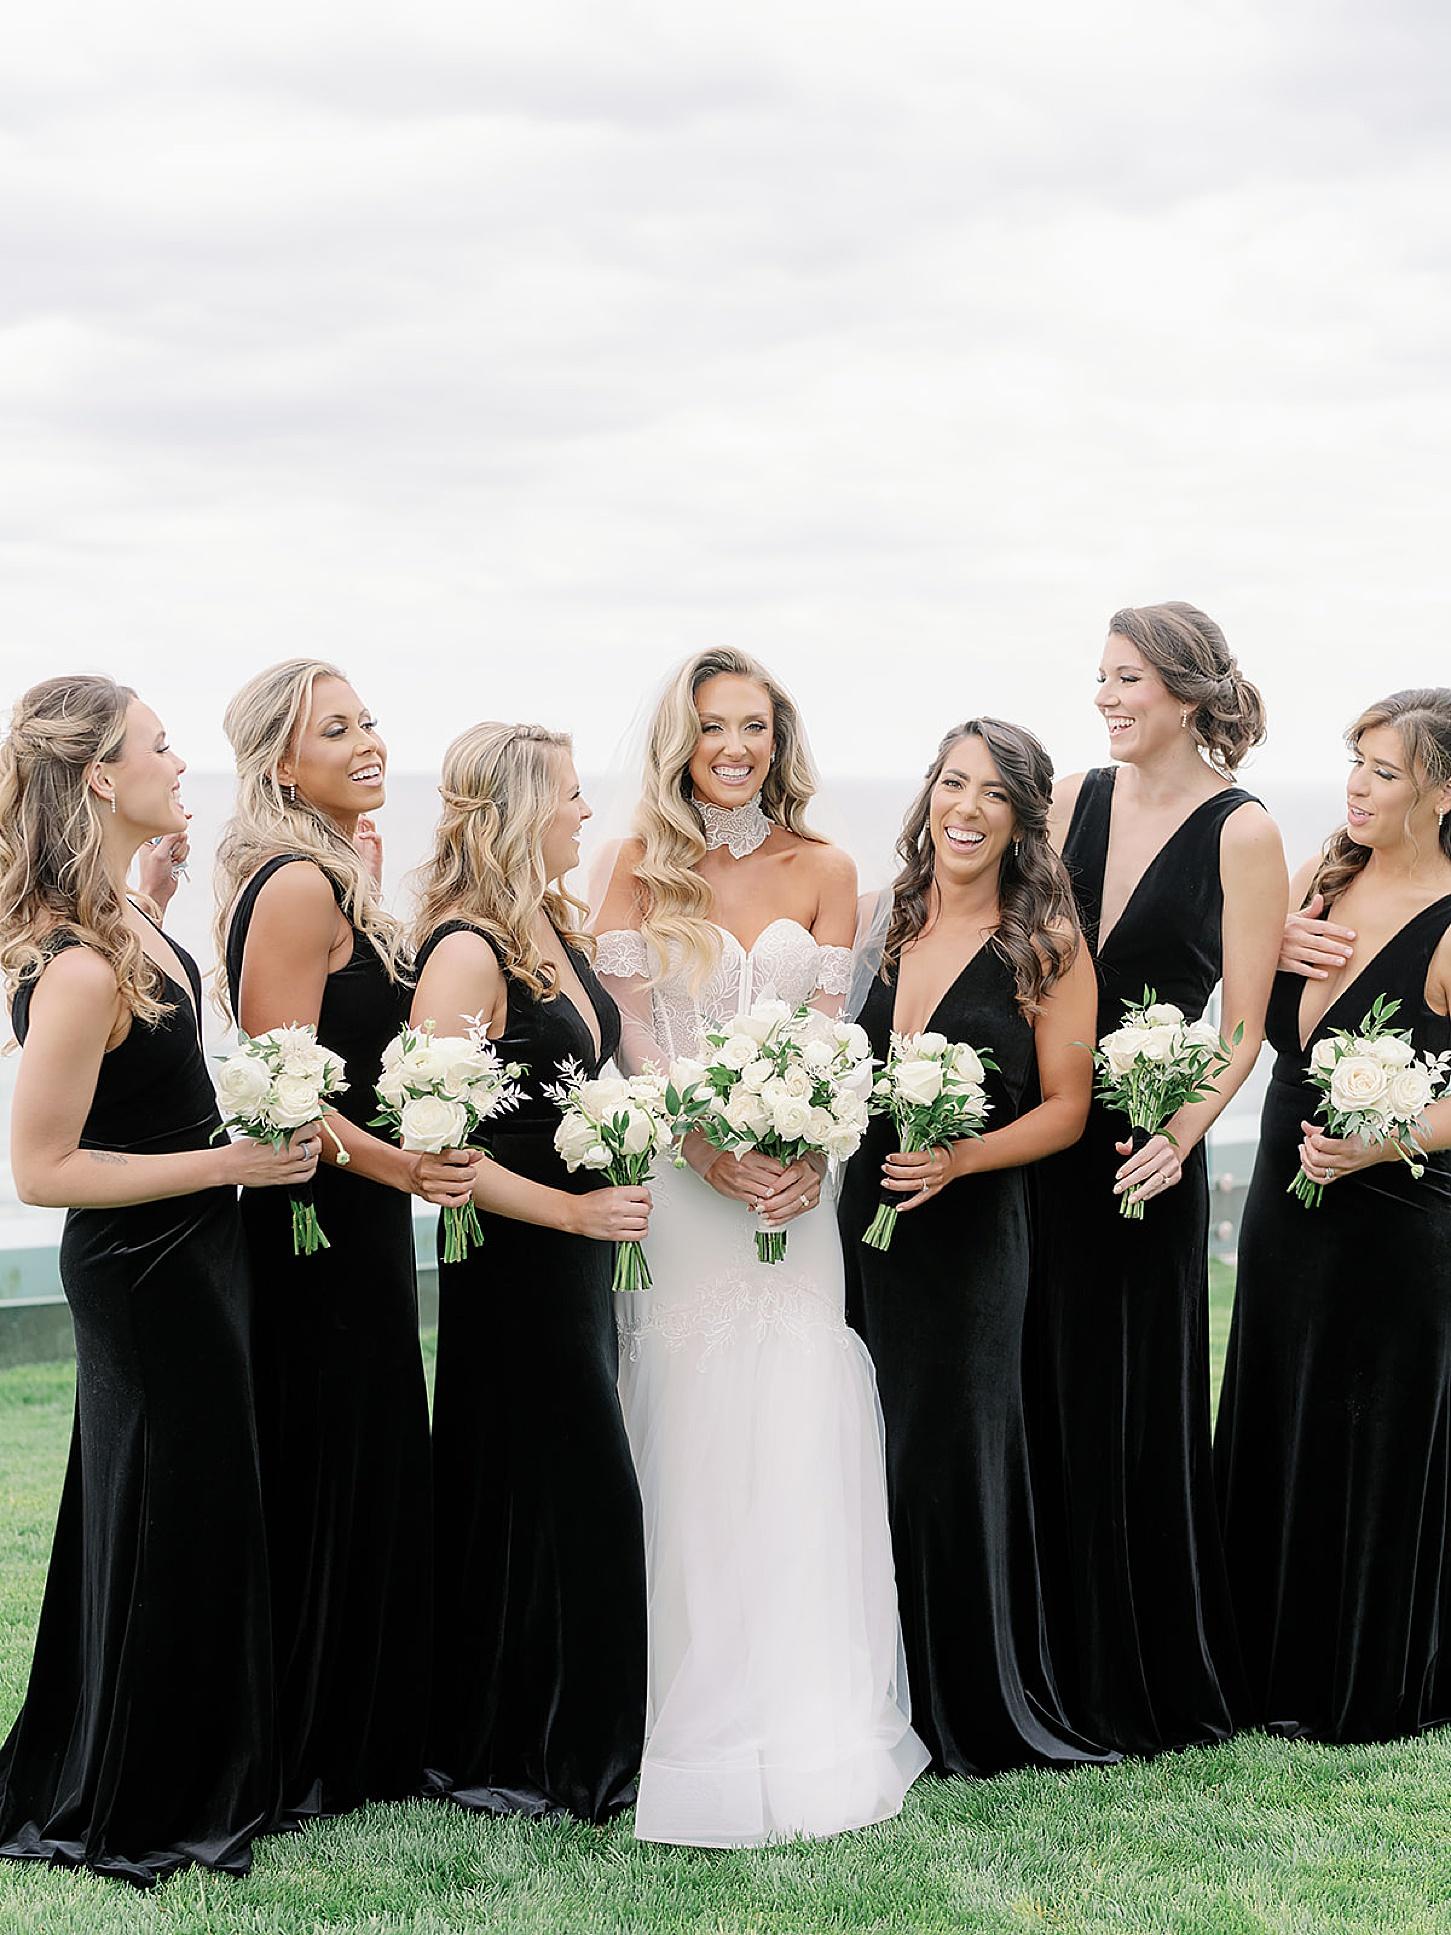 Atlantic City Wedding Photography Studio by Magdalena Studios Lexy Cha 0032